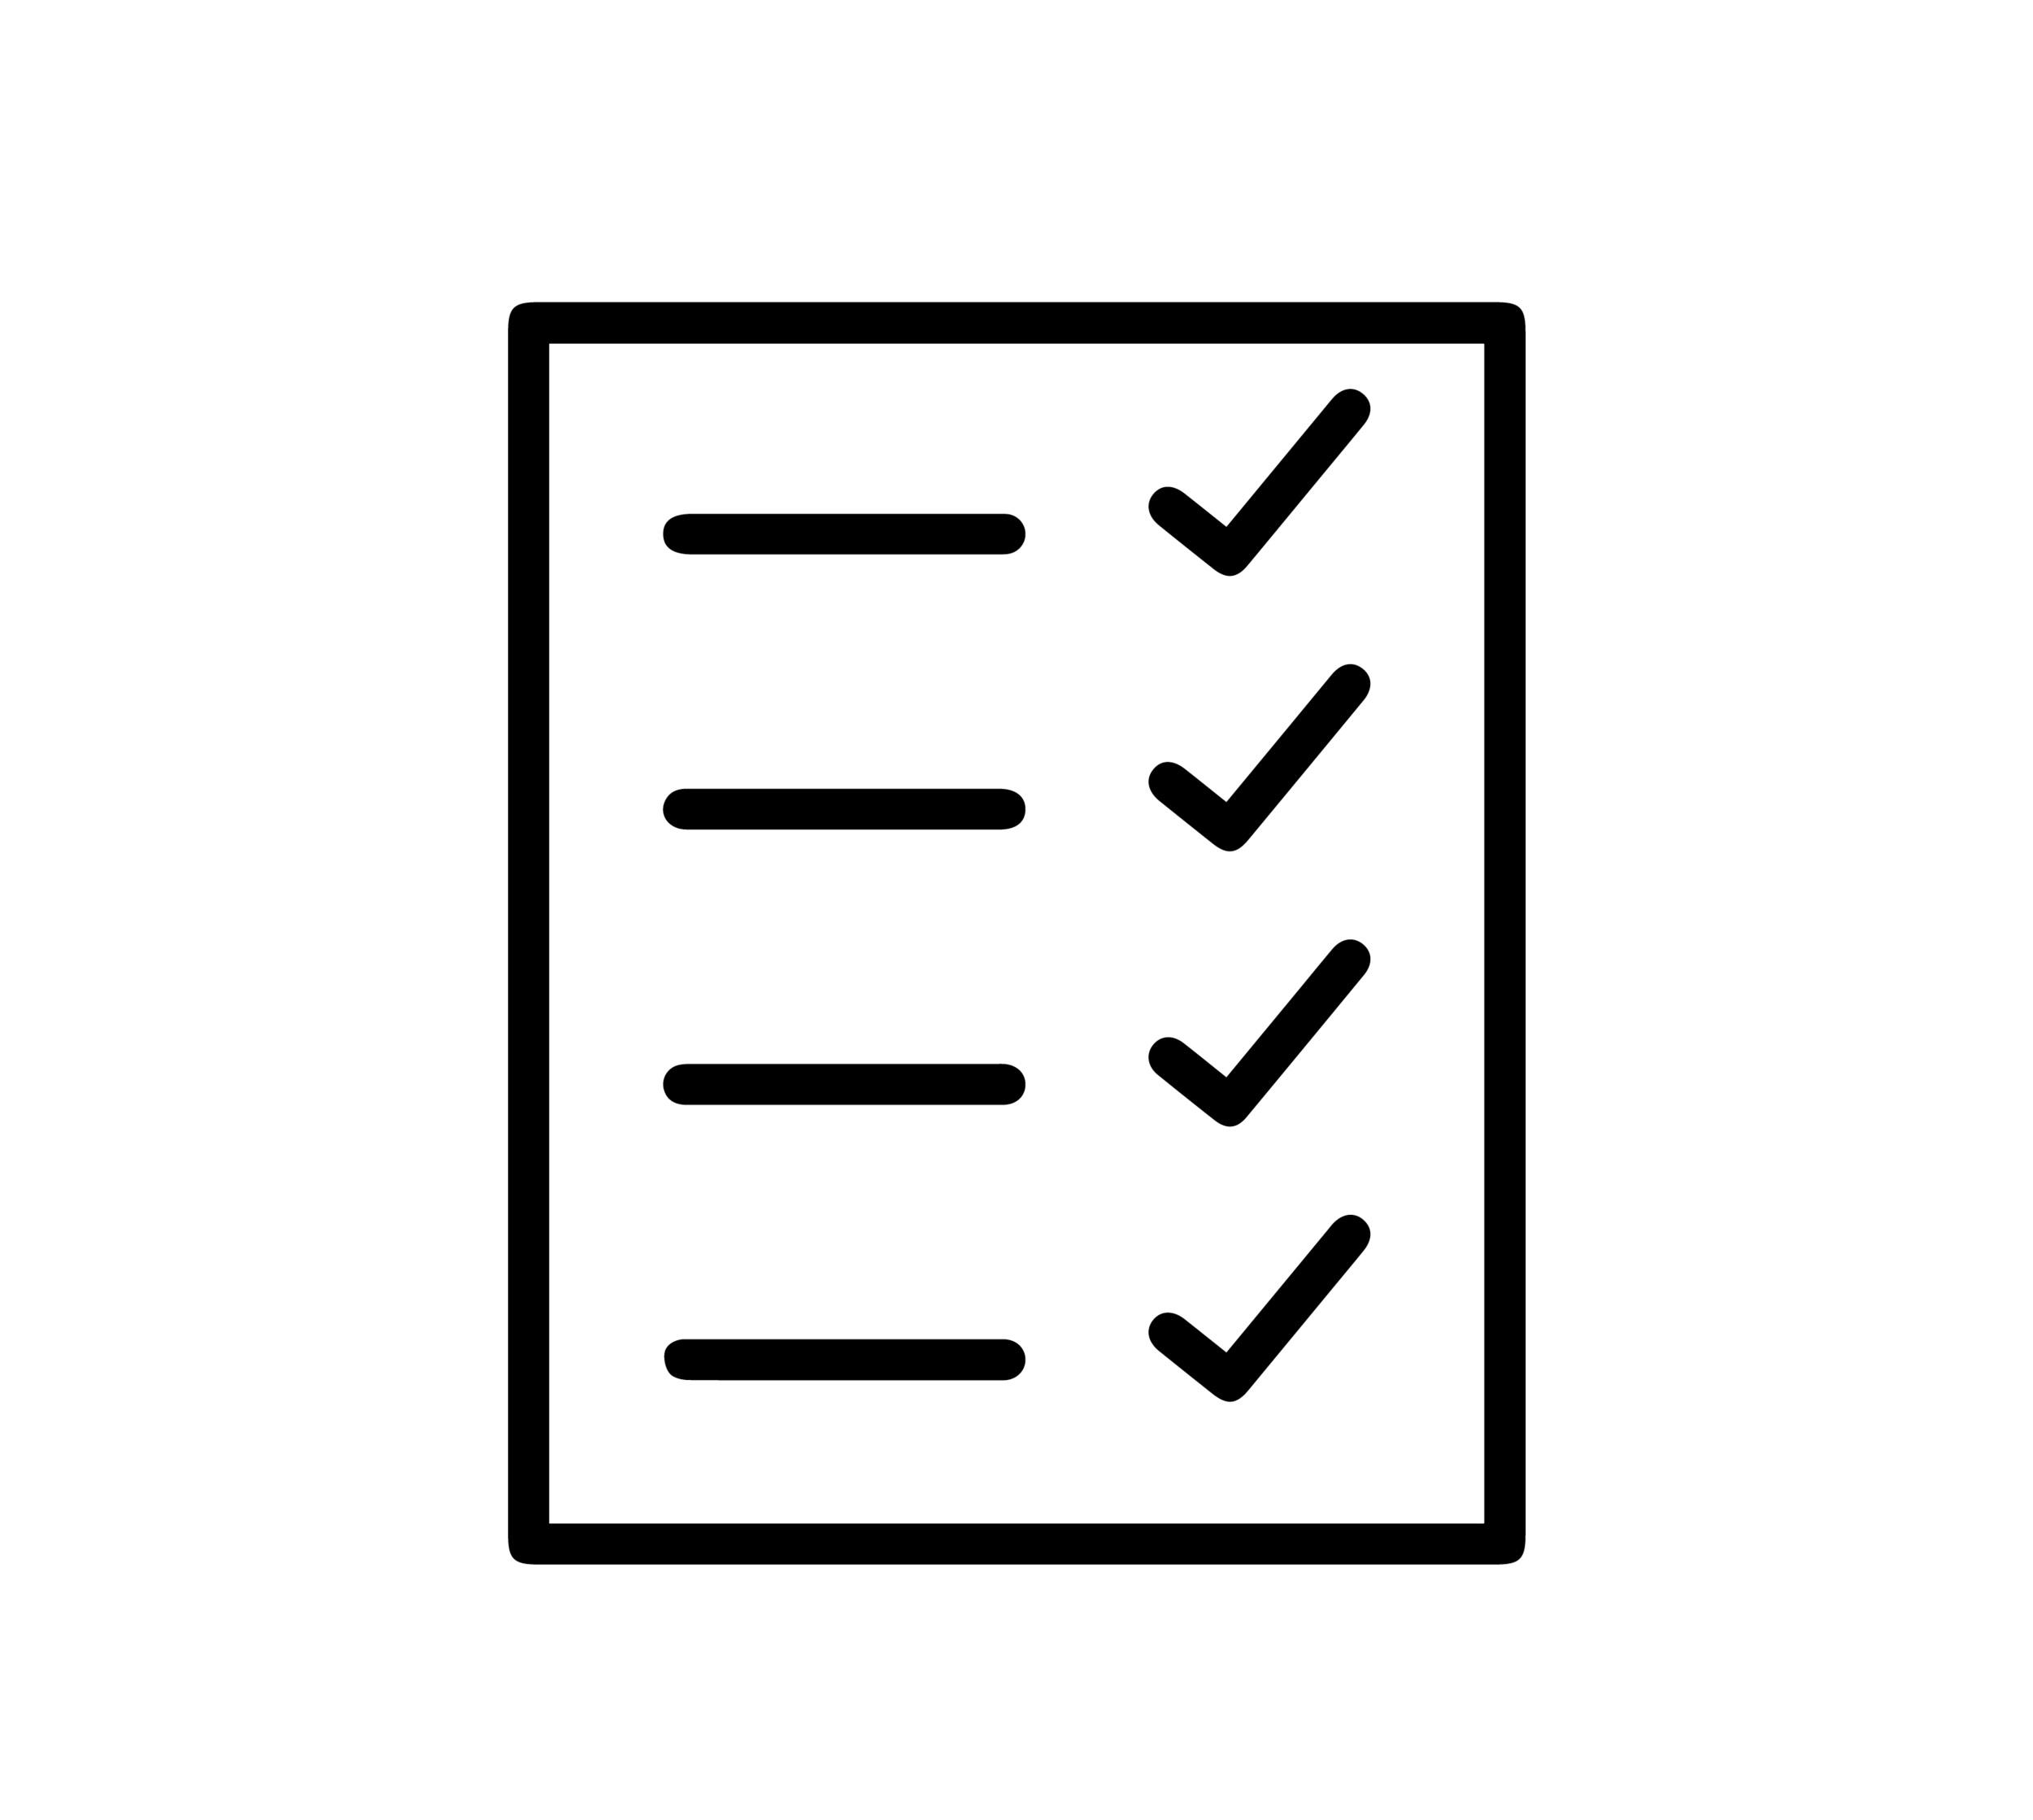 Breaks down processes into simple tasks